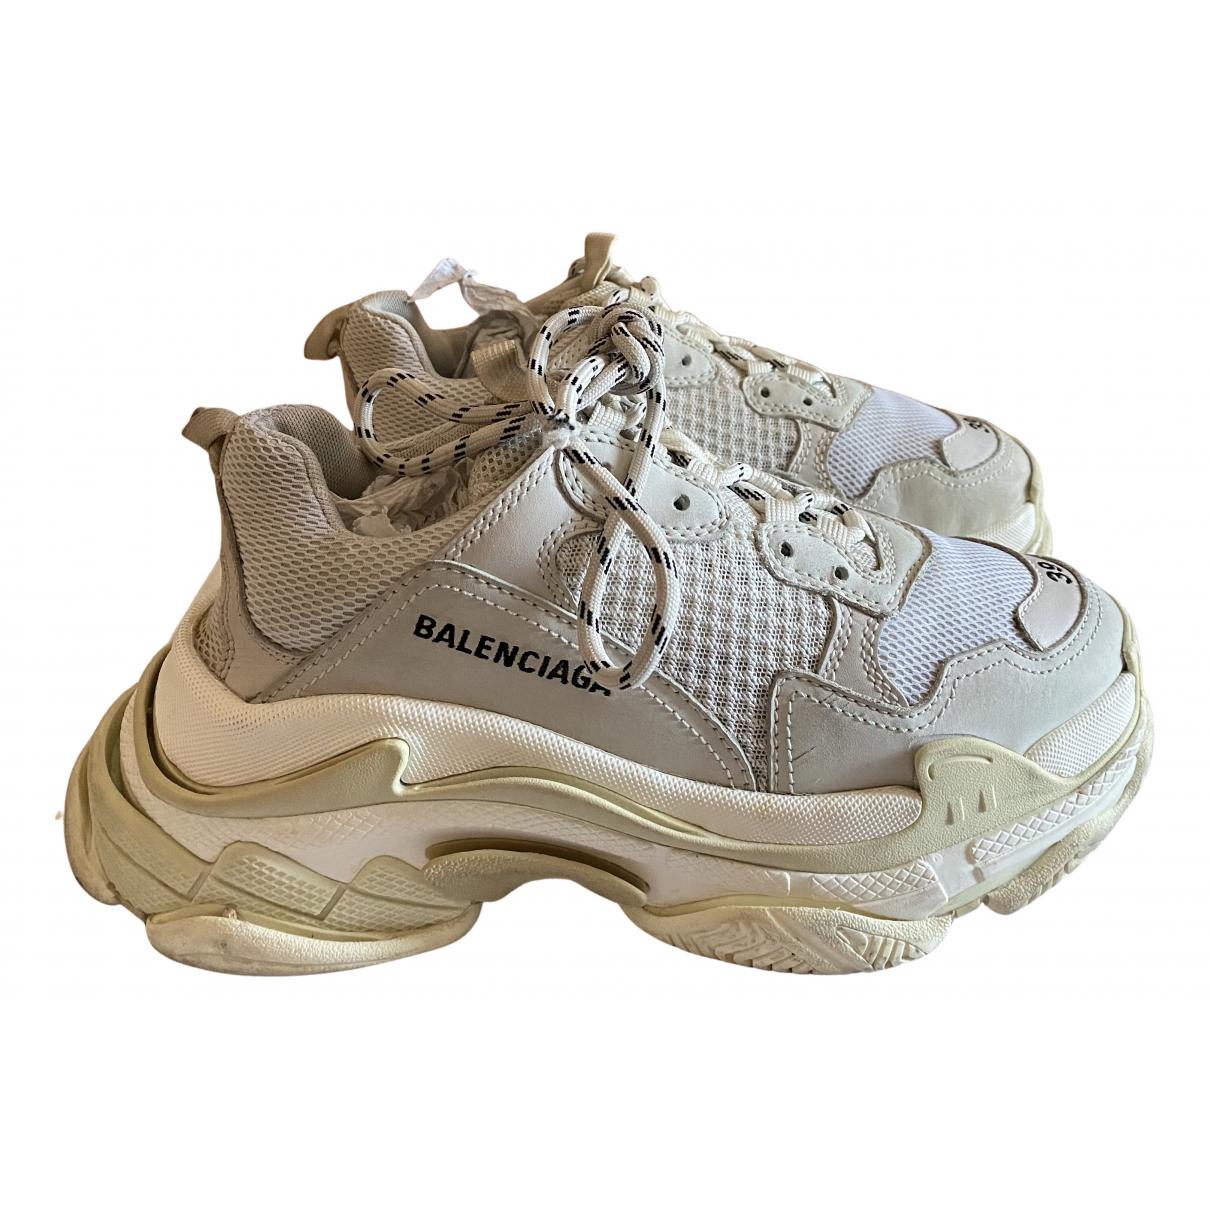 Balenciaga Triple S Sneakers in  Weiss Kalbsleder in Pony-Optik